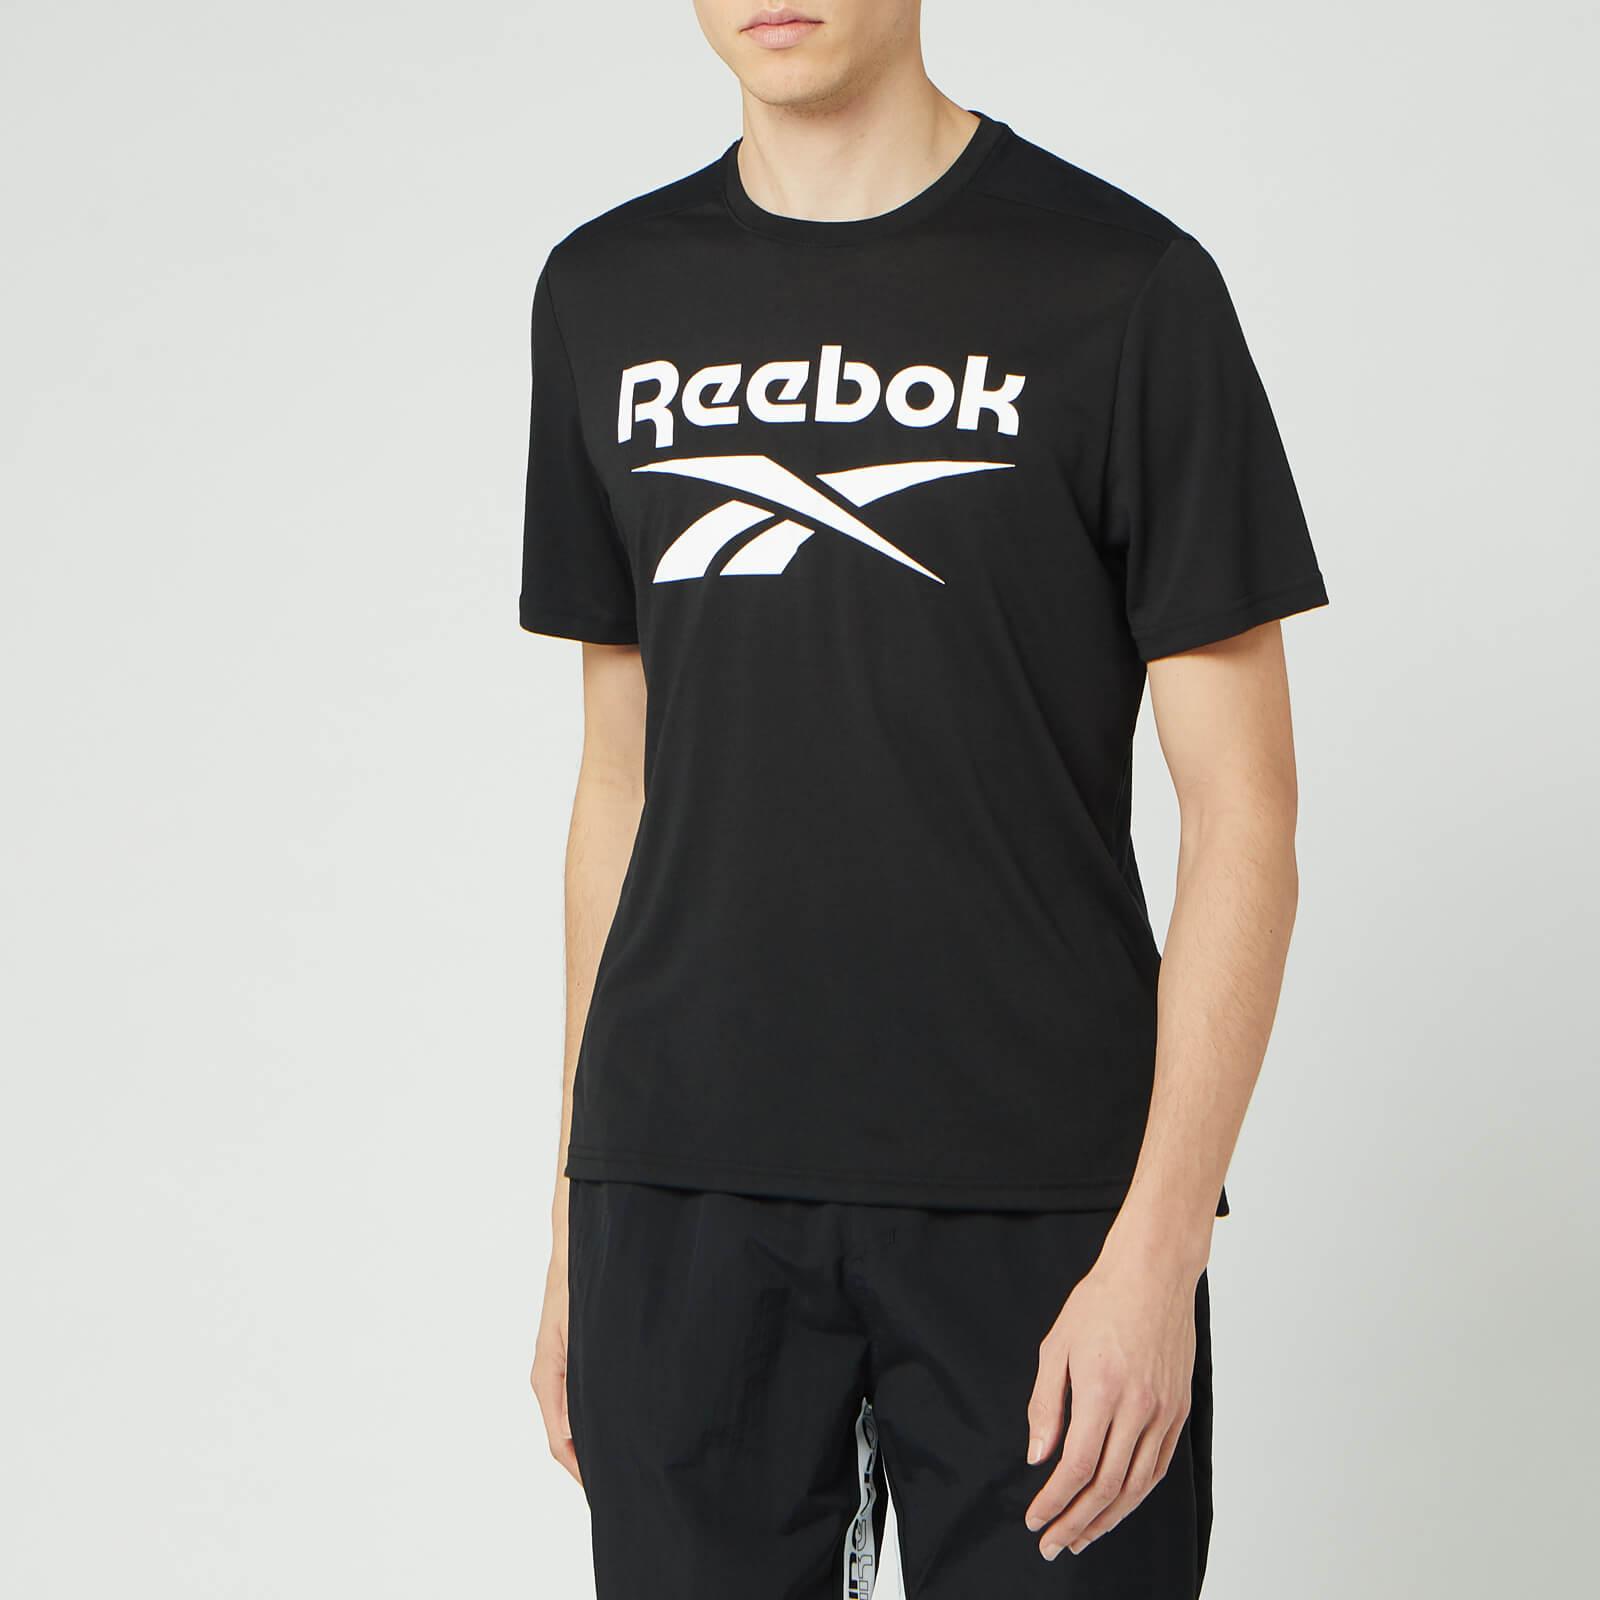 Reebok Men's Supremium Graphic Short Sleeve T-Shirt - Black - M